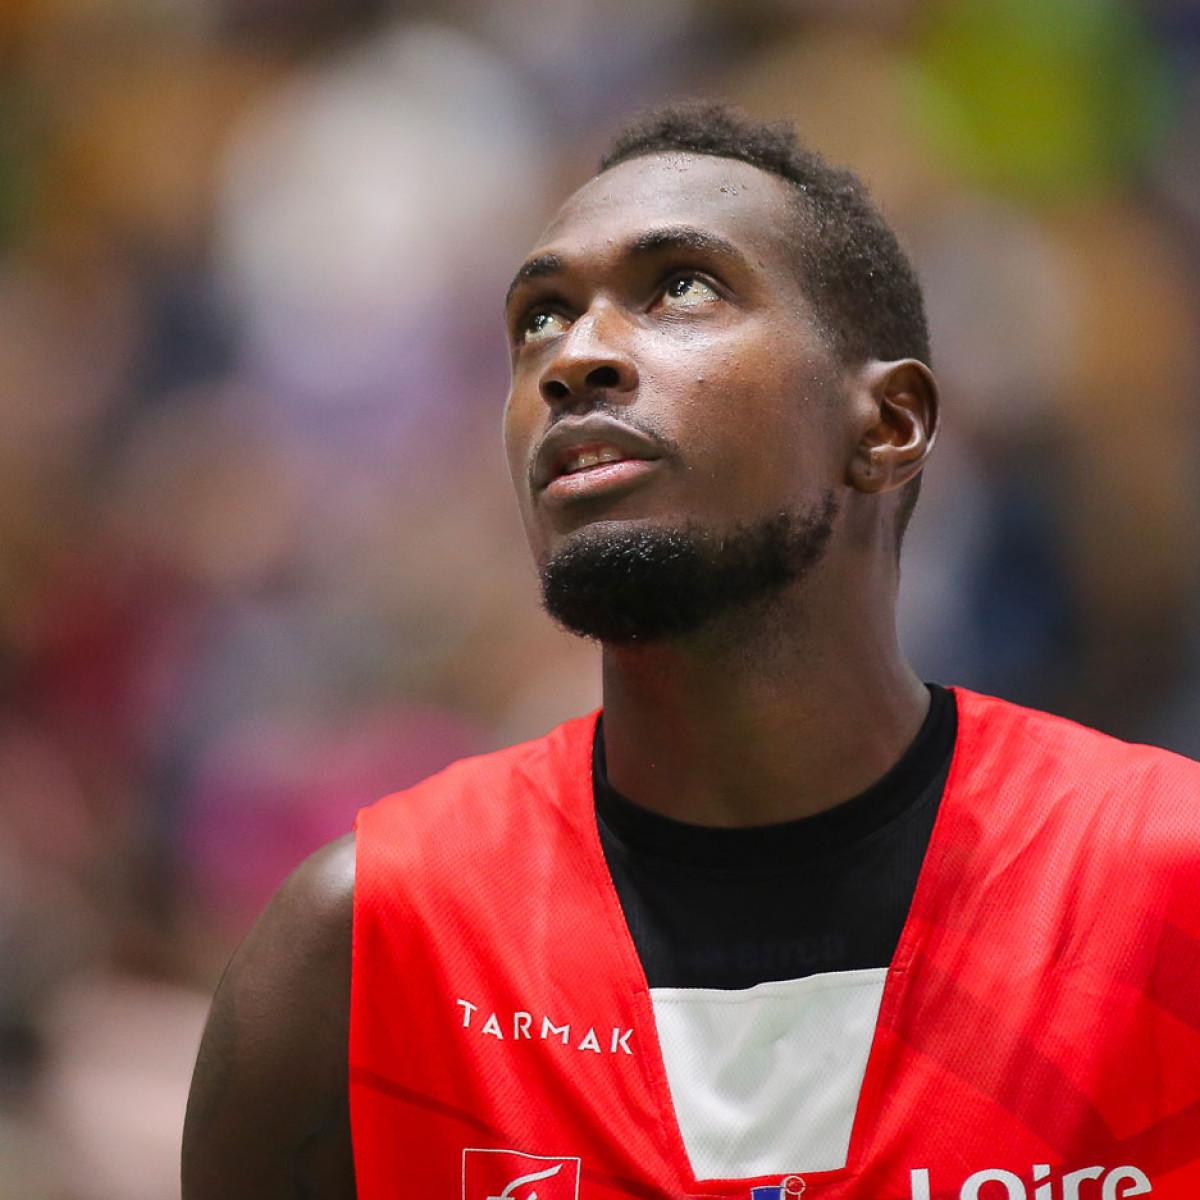 Photo of Jean-Stephane Rinna, 2019-2020 season